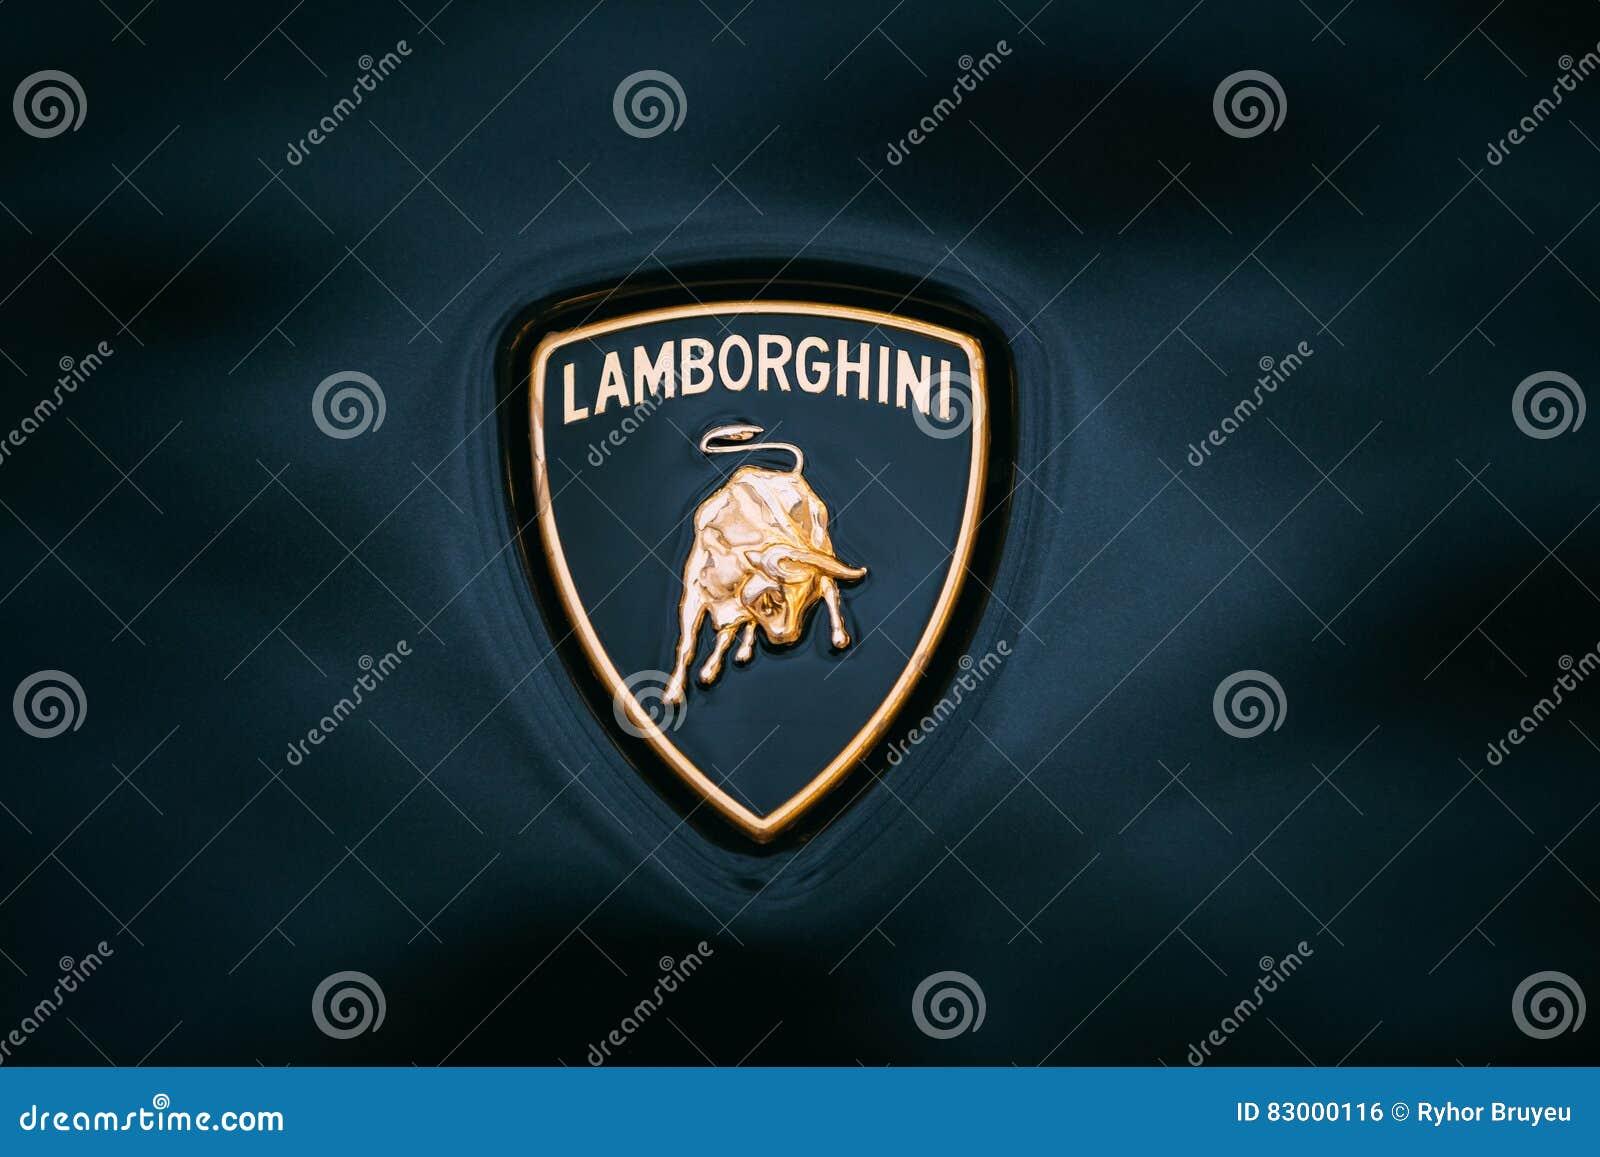 Sluit Omhoog Logo Of Lamborghini Op Donkerblauwe Achtergrond